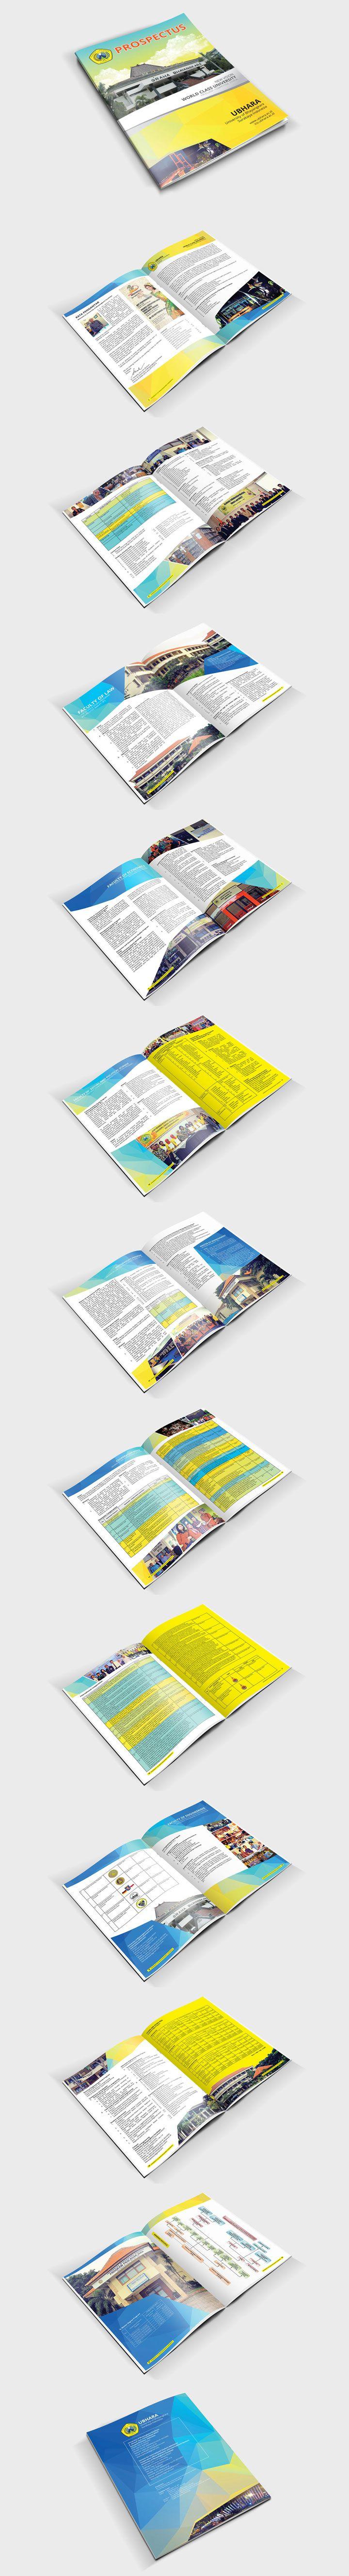 PROSPECTUS BHAYANGKARA UNIVERSITY | AREXGRAPH DESIGN